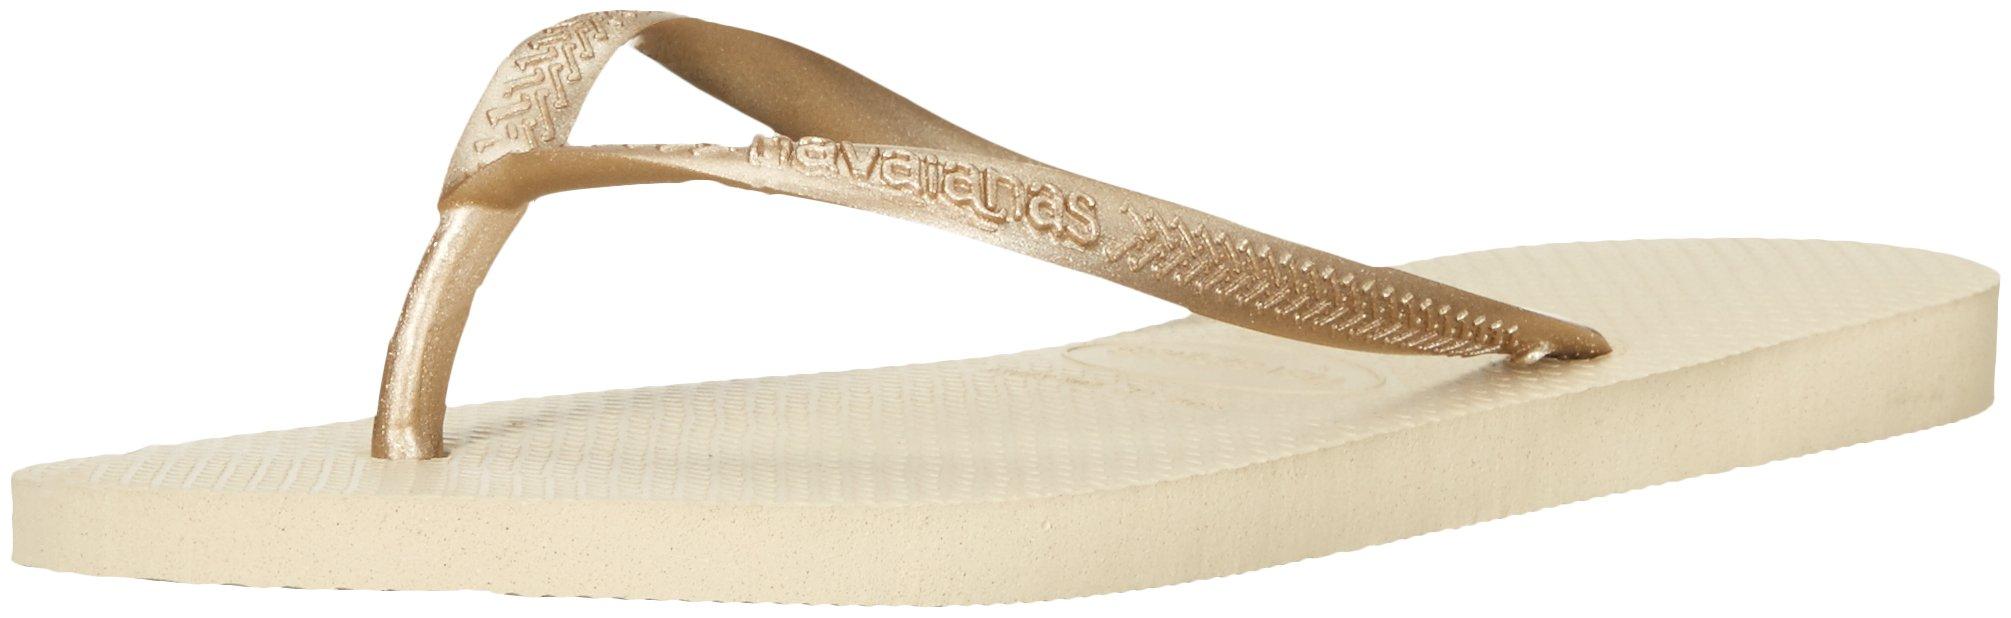 Havaianas Women's Slim Sandal,Sand Grey/Light Gold,39/40 BR (9-10 M US)